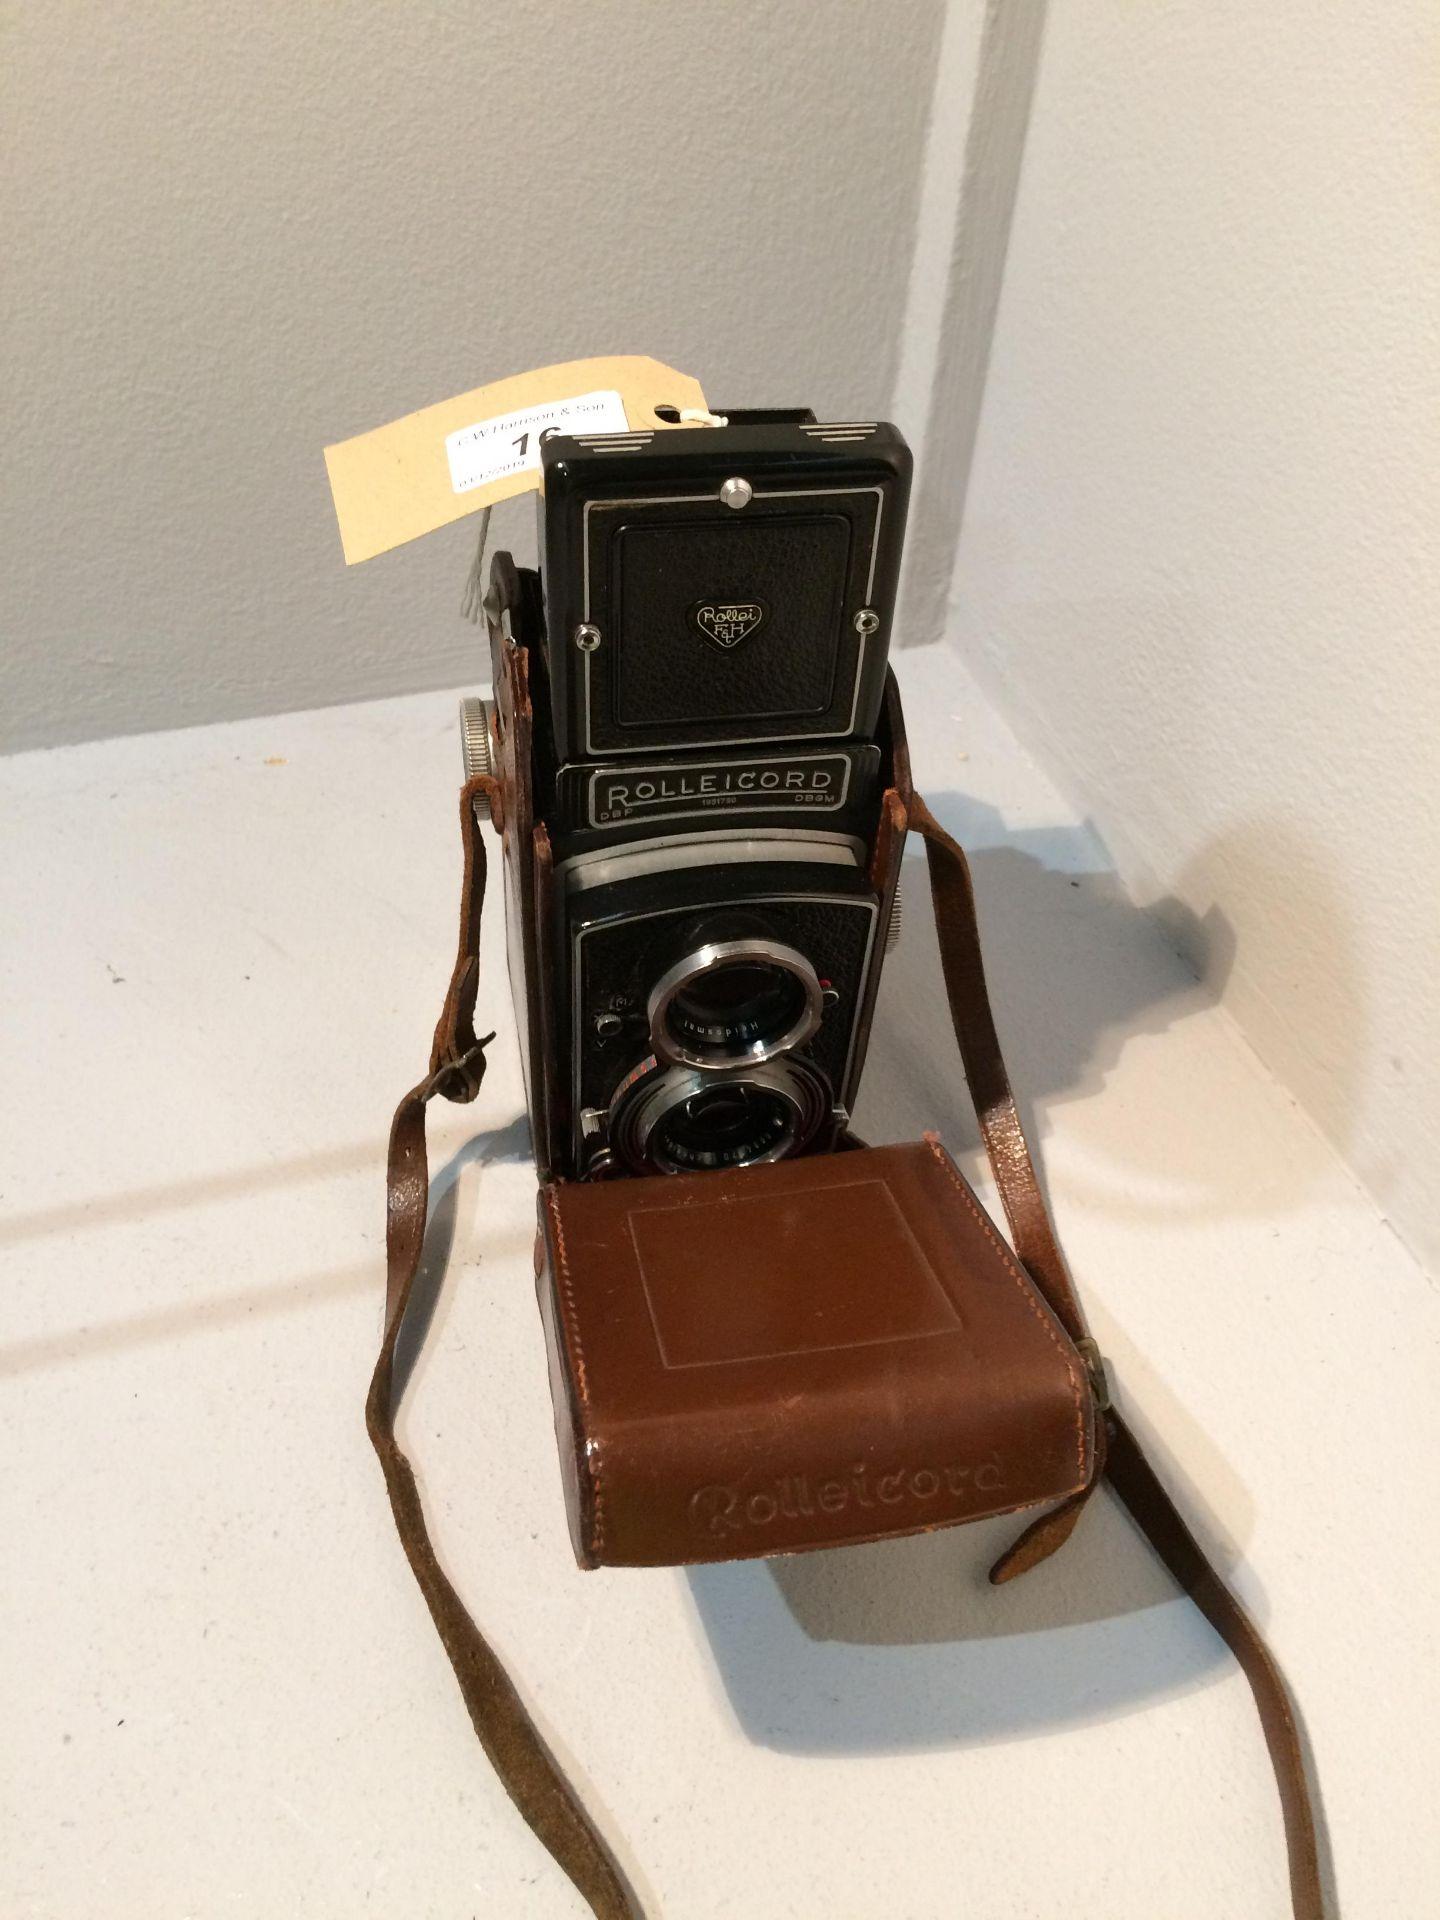 Lot 16 - Rolleicord Franke & Heidecke DGBM no. 1931790 camera, Xenar 1..3.